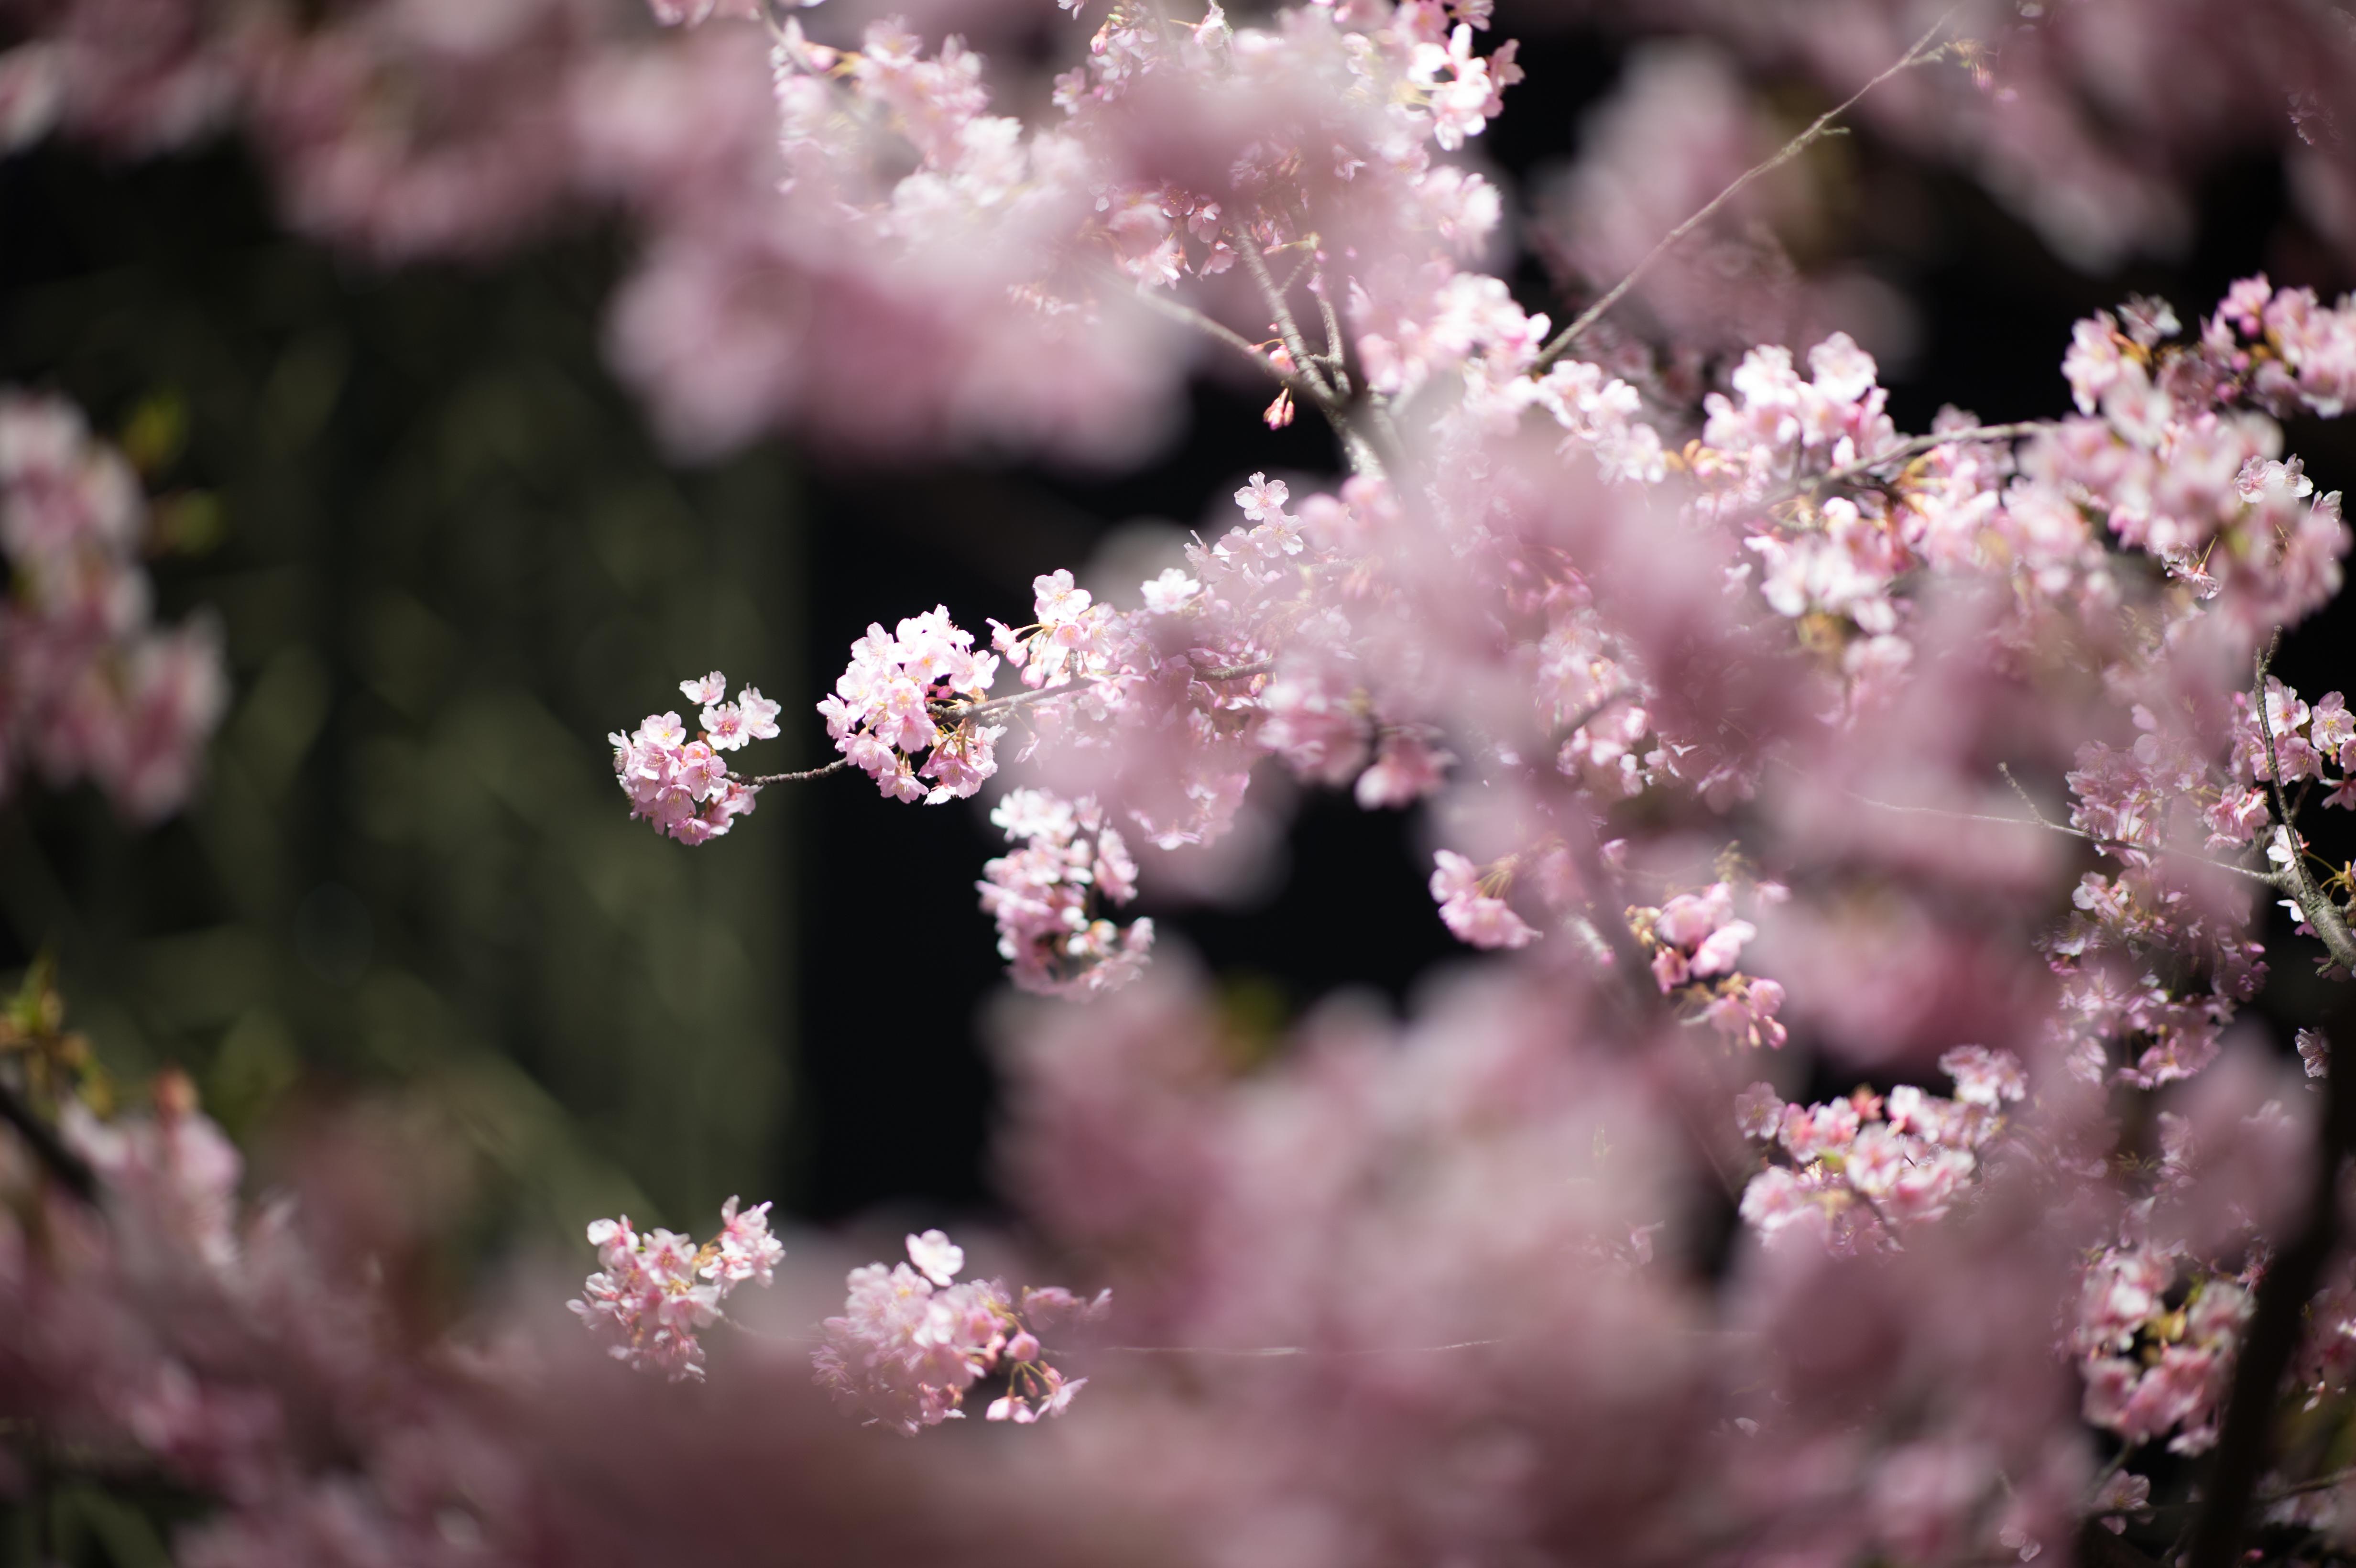 Must see Wallpaper Night Cherry Blossom - Japan-night-architecture-nature-branch-tower-cherry-blossom-Nikon-blossom-pink-spring-Tokyo-Jp-Skytree-nikkor-flower-illuminated-plant-cherryblossom-illumination-flora-petal-landmark-tokyoskytree-afs105mmf14eed-afsnikkor105mmf14eed-df-miyabi-botany-flowering-plant-shrub-macro-photography-487756  Snapshot.jpg